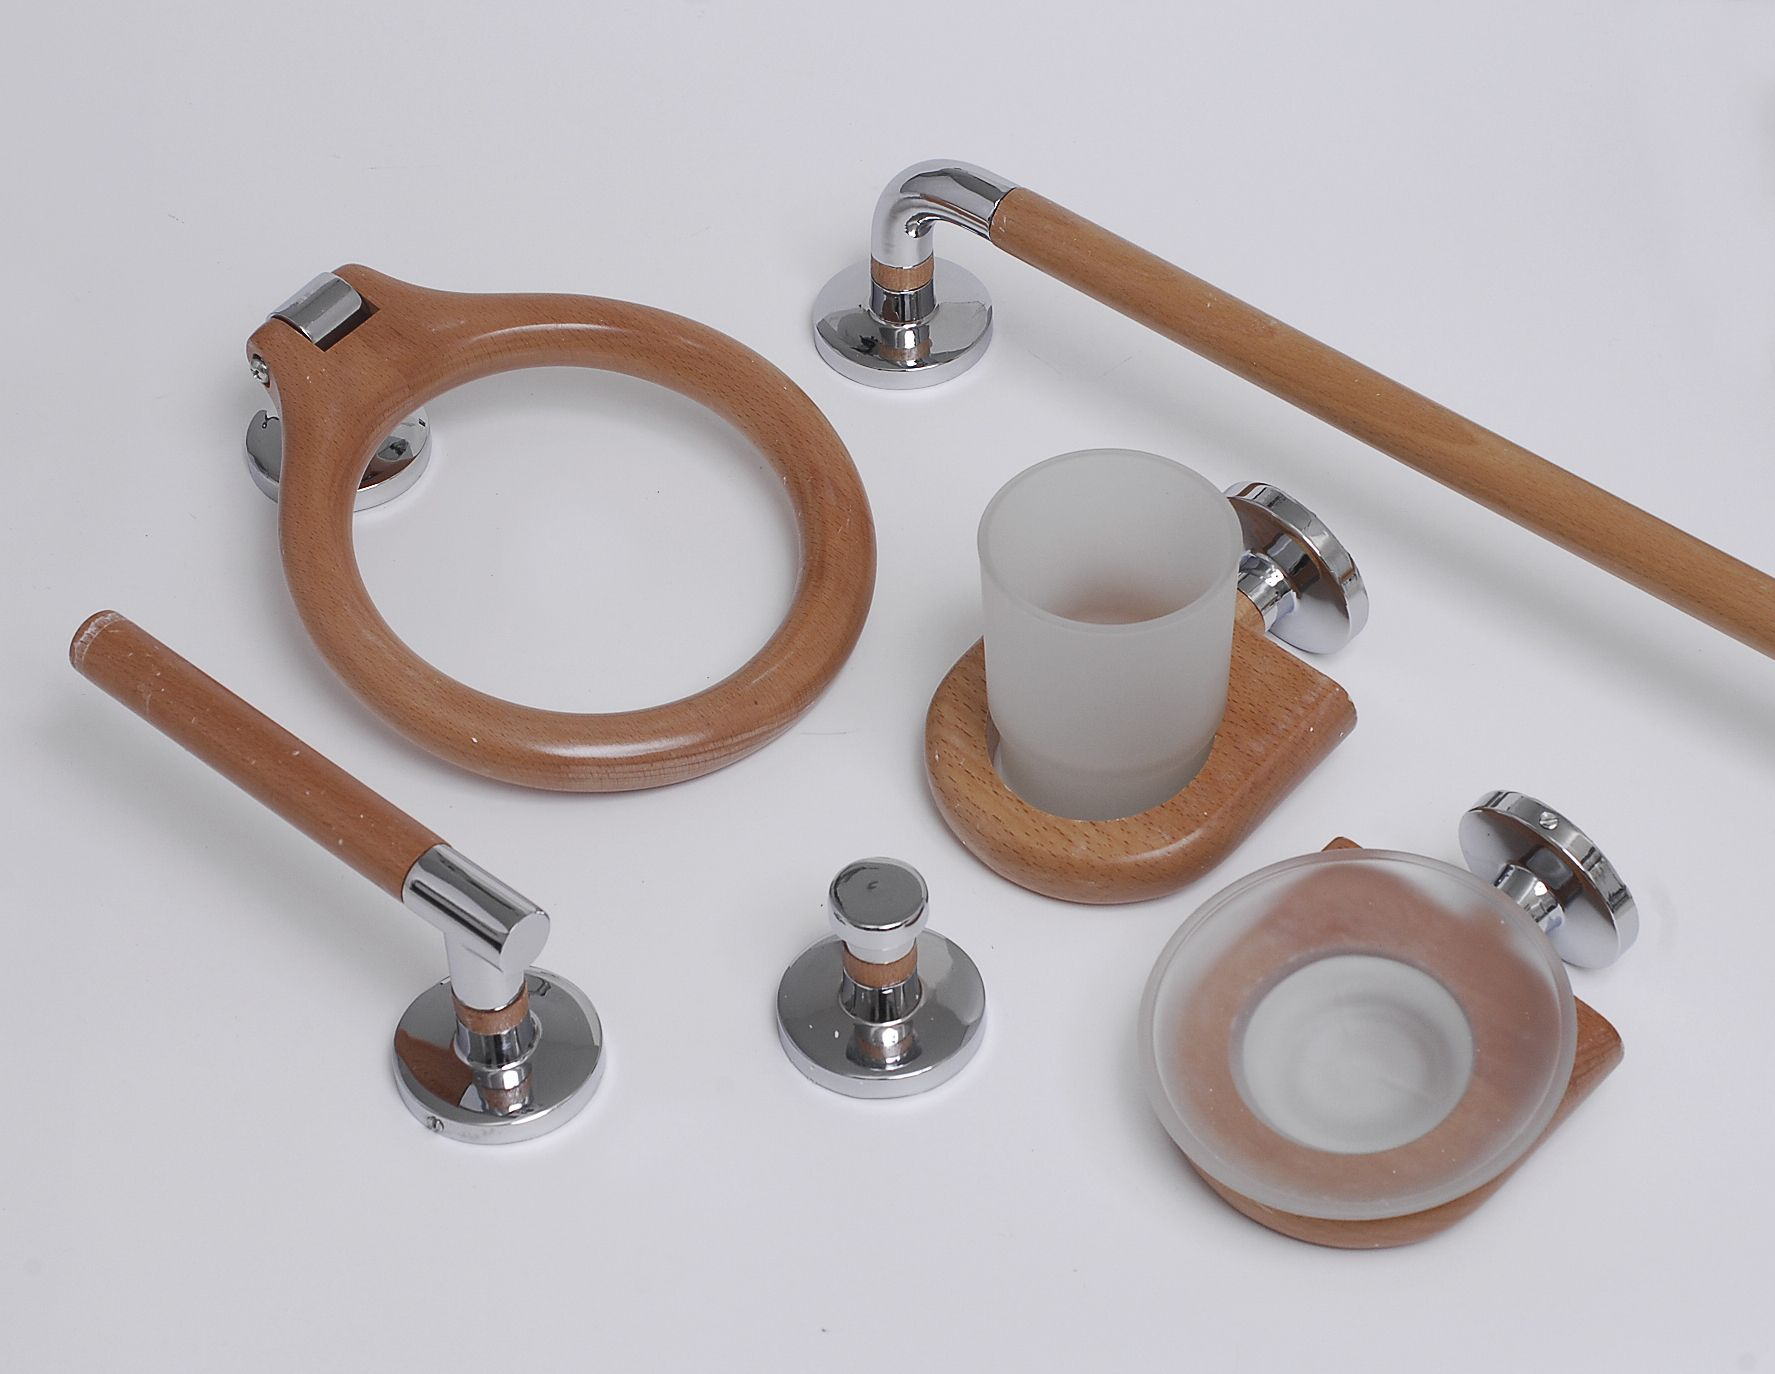 Set accesorios ba o madera 6pzs cod sam accesorios para for Set de accesorios para bano